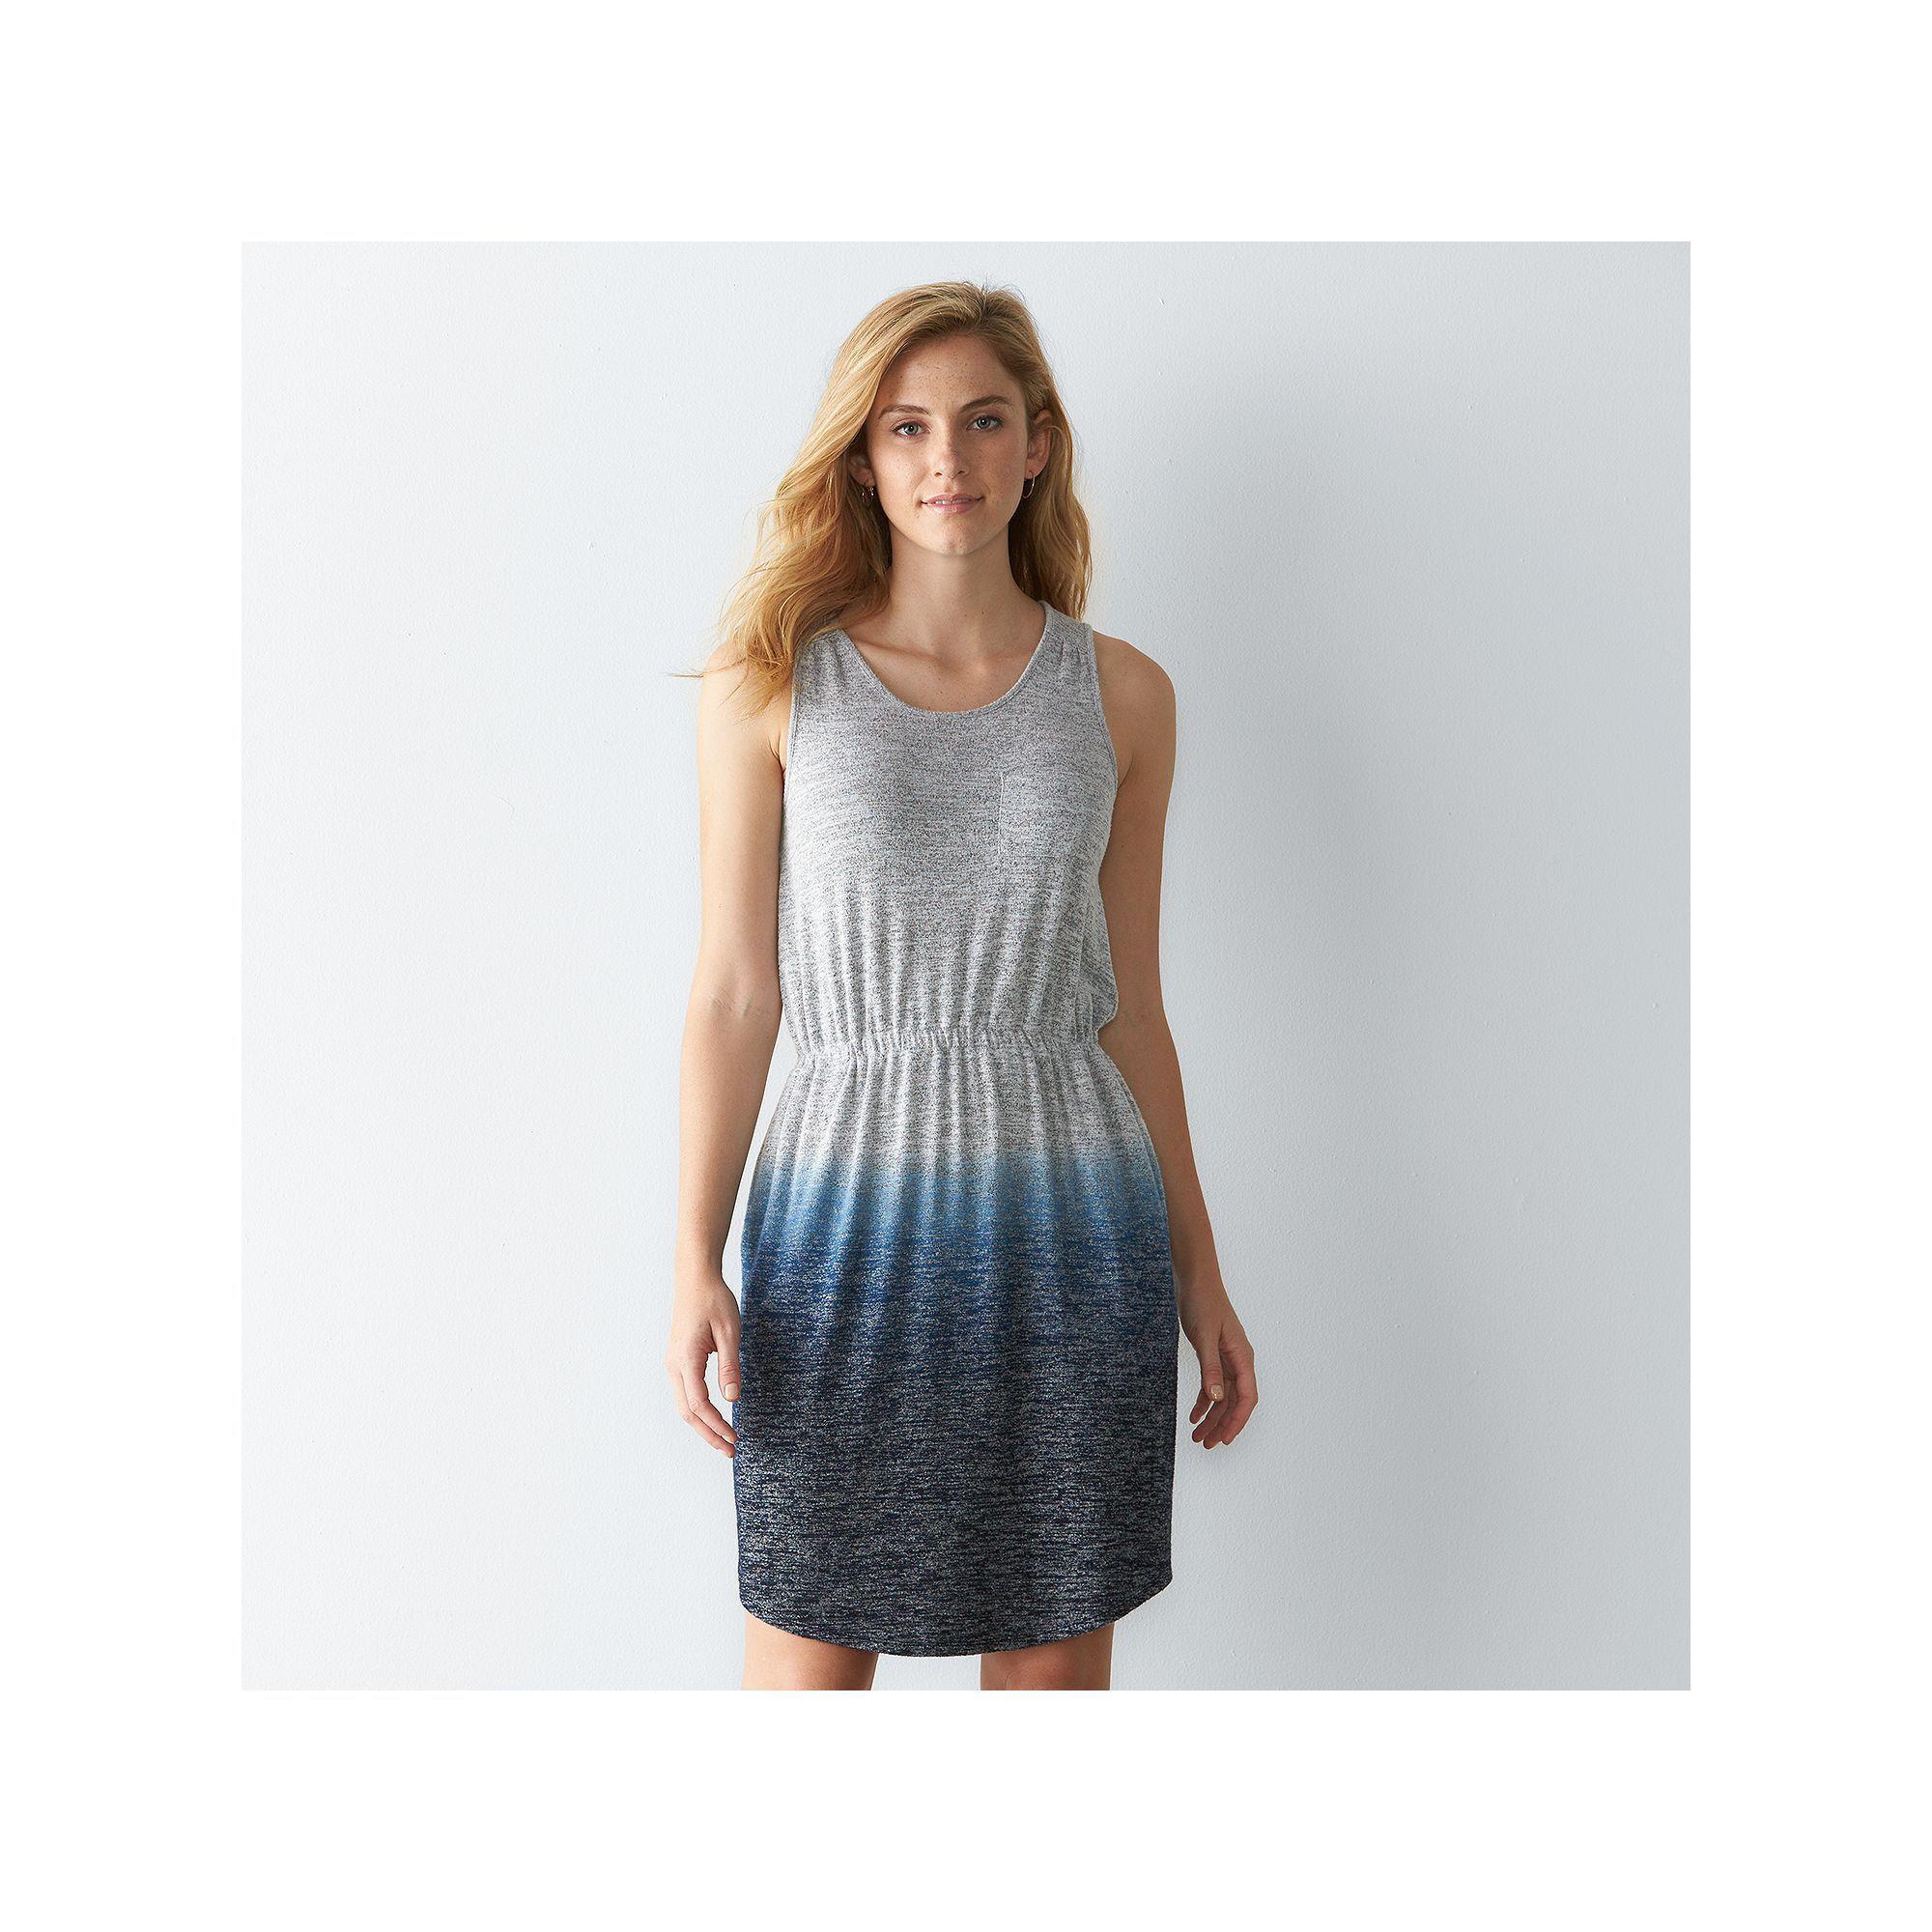 Womenus sonoma goods for lifeâue dipdyed tank dress size xl